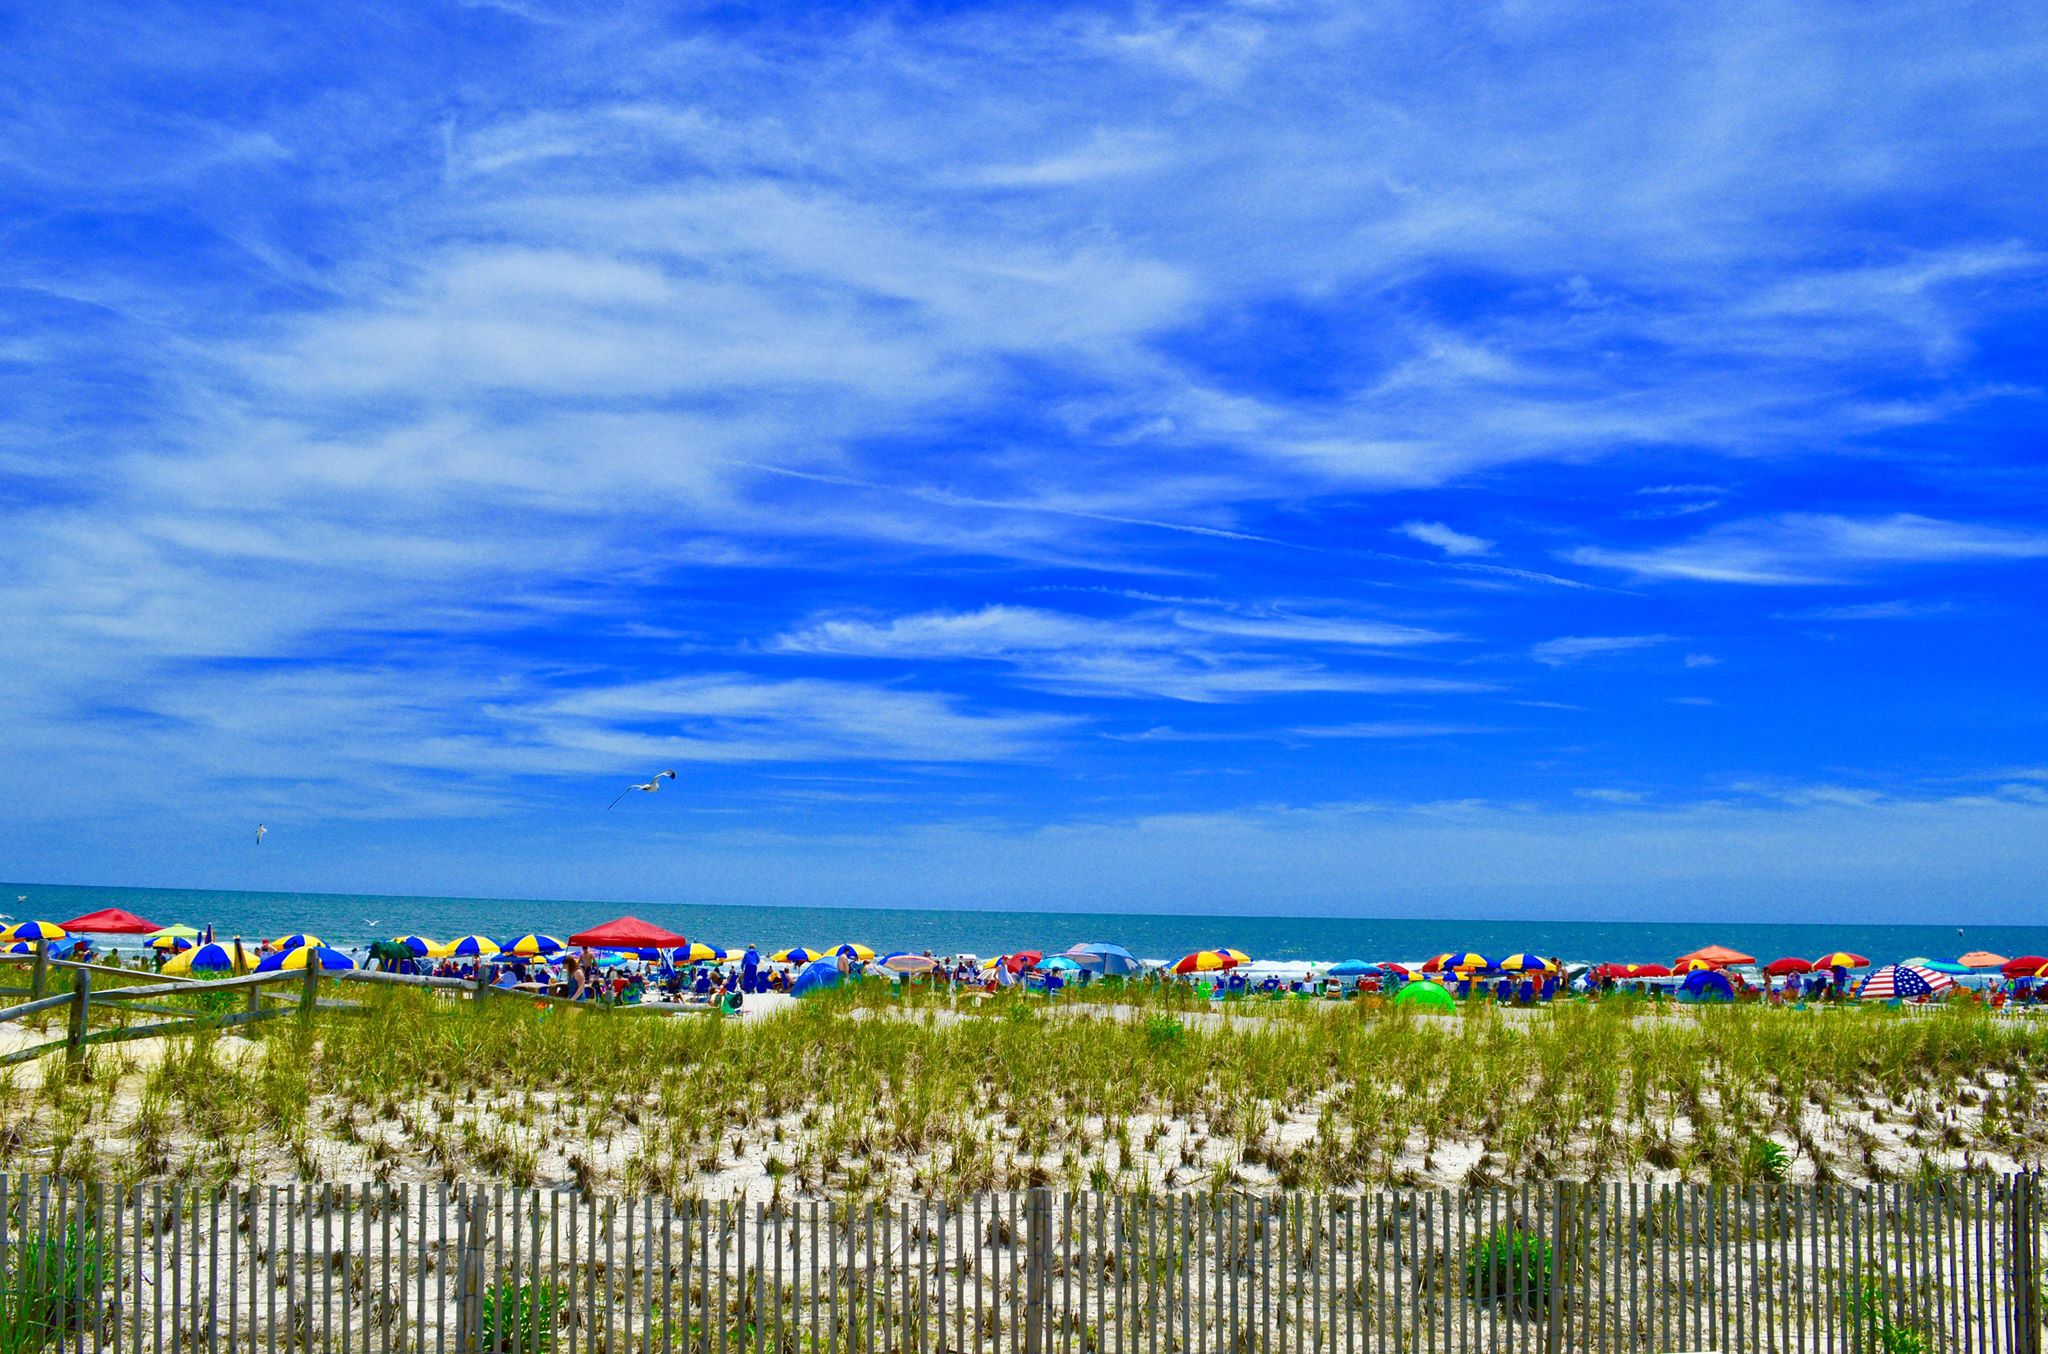 ocean city, boardwalk, beach, summer, vacay